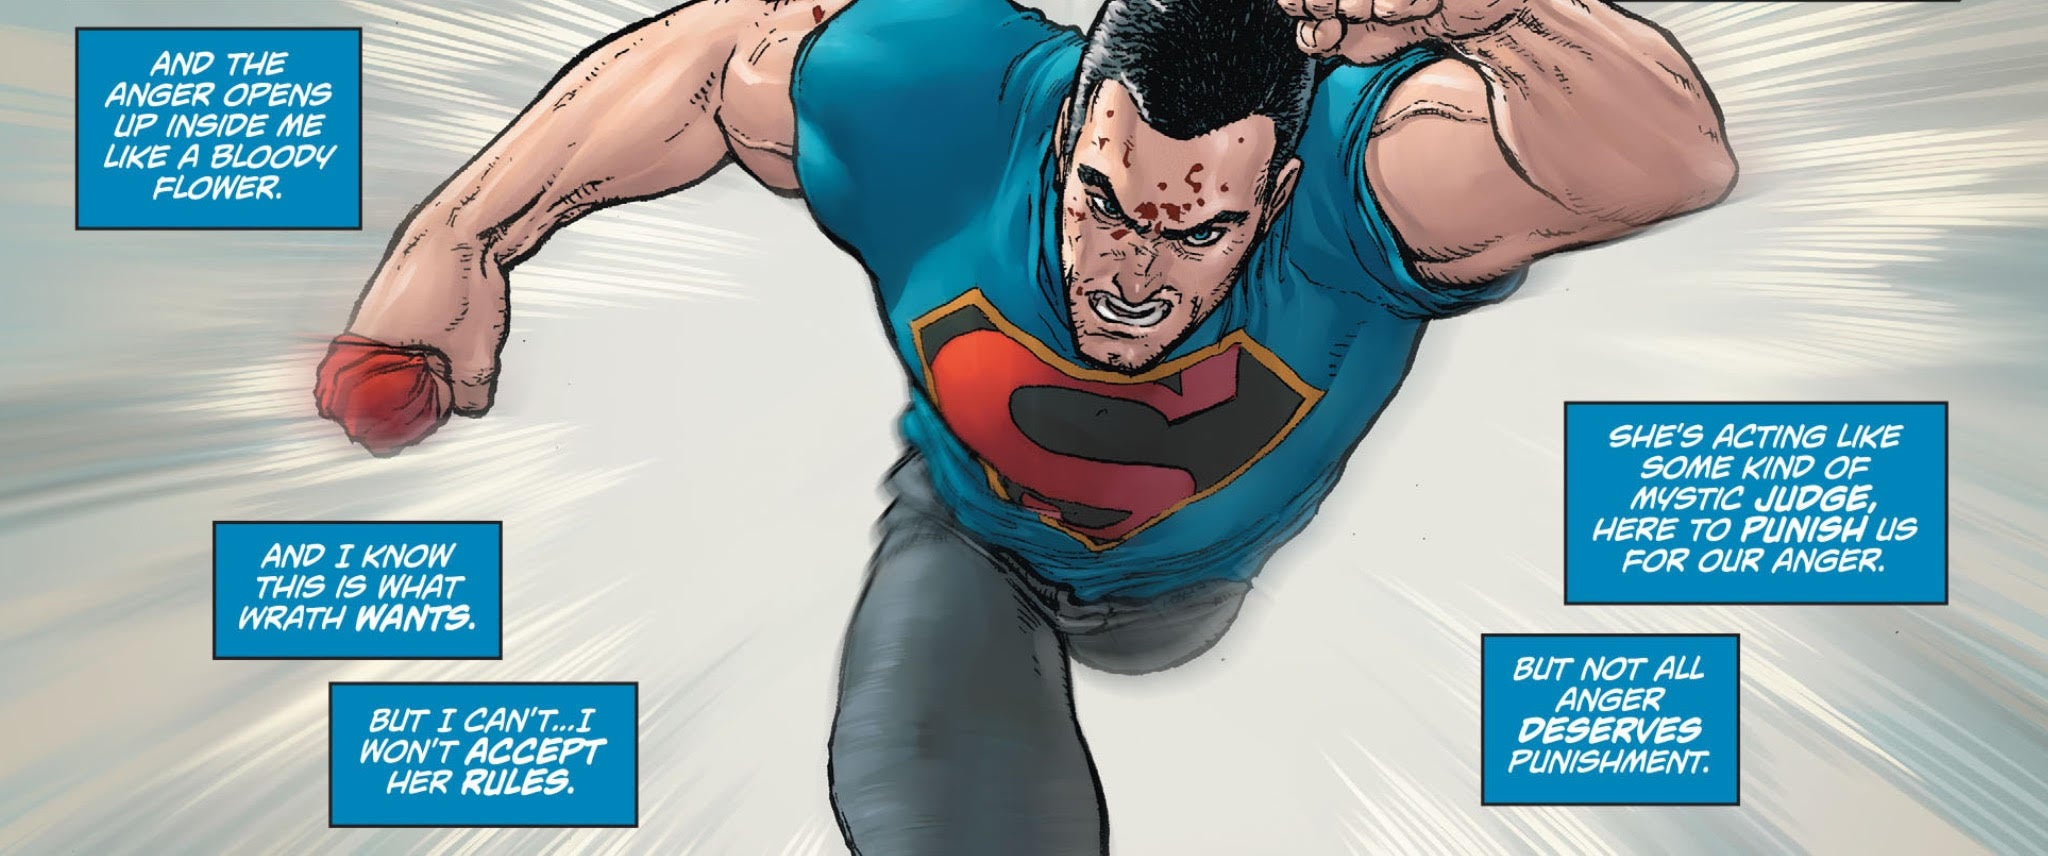 Action Comics - Anger